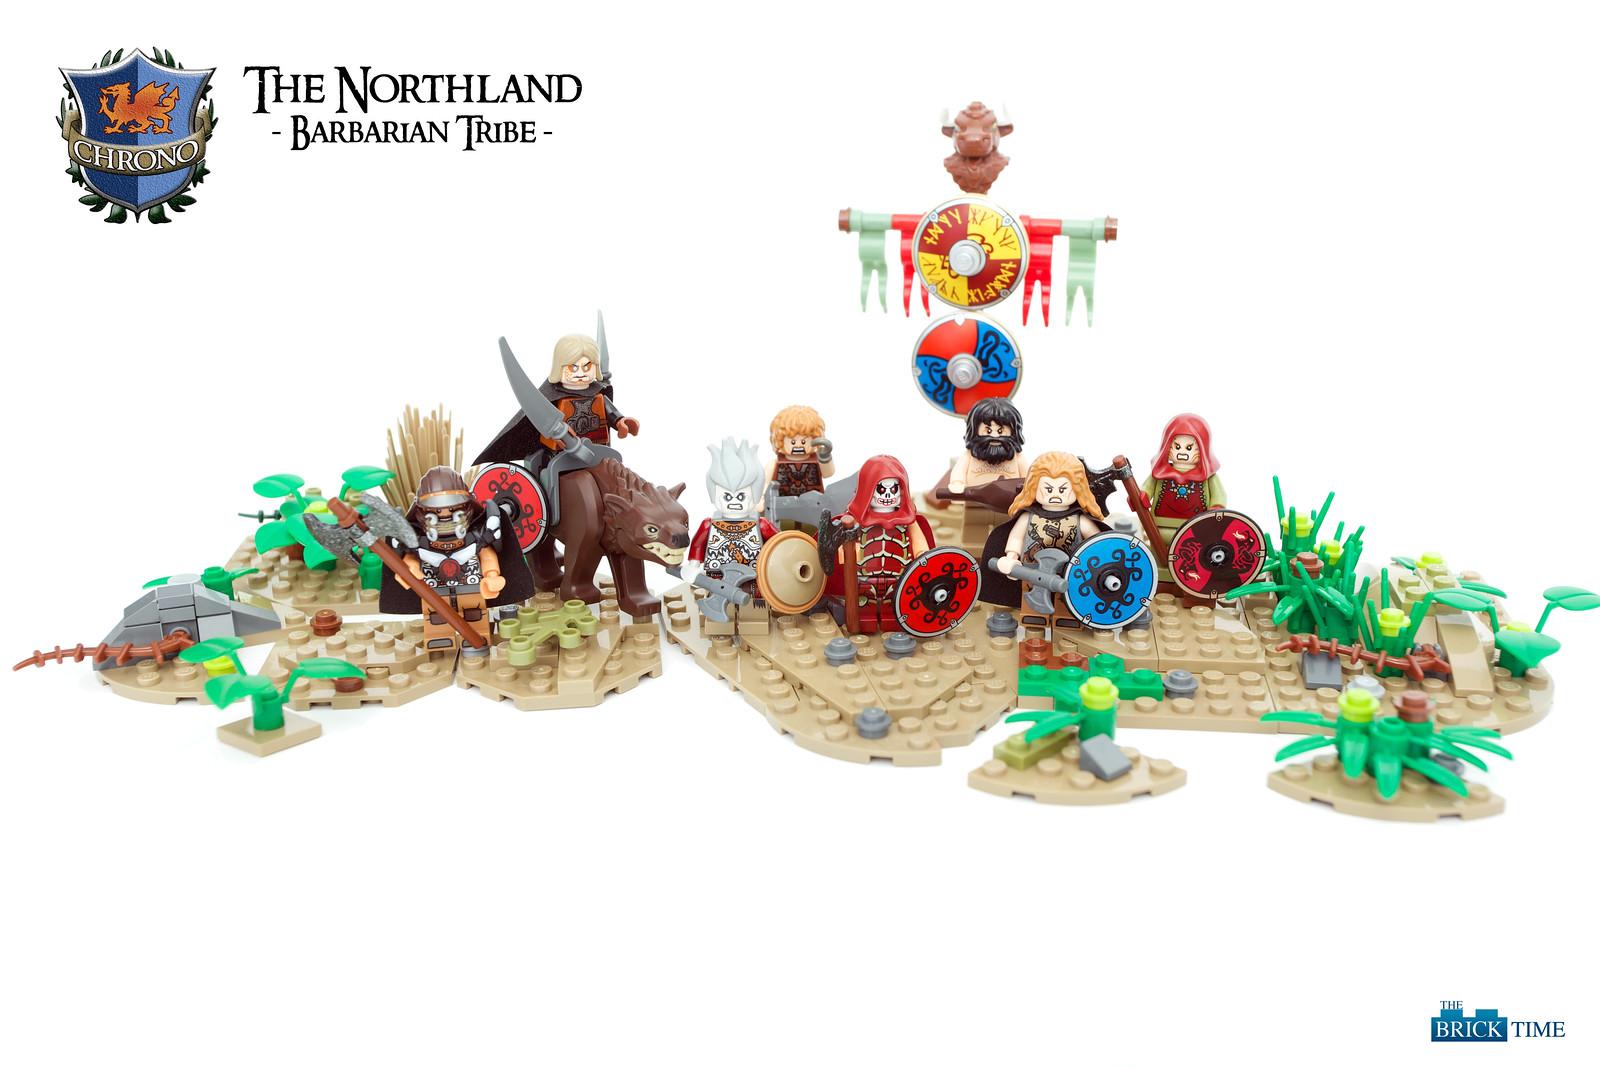 Barbarian Tribe